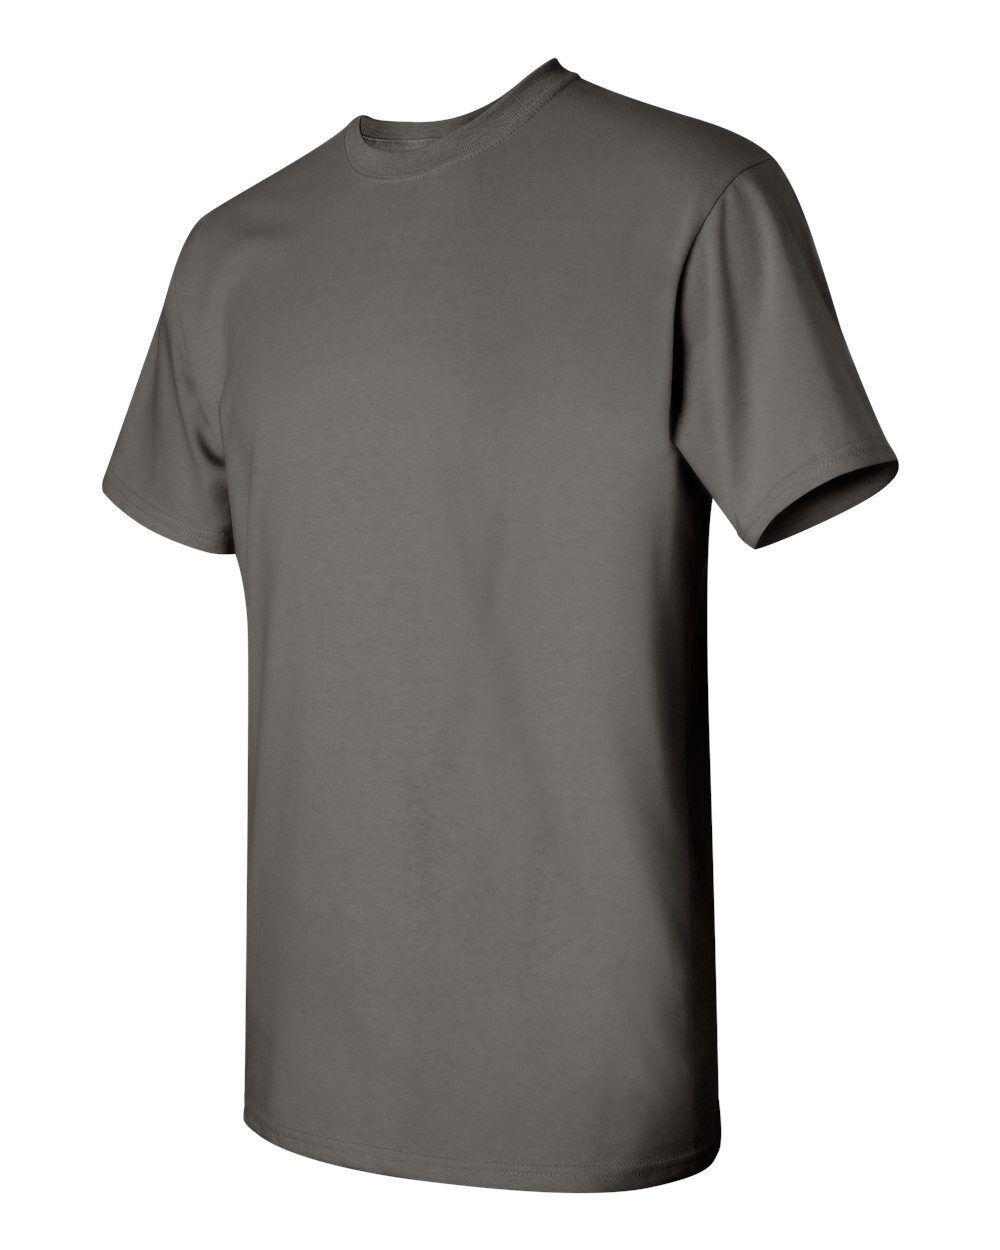 5 NEW MEN Wholesale Gildan 100% Cotton Charcoal Adult T-Shirts 2XL 3XL 4XL 5XL